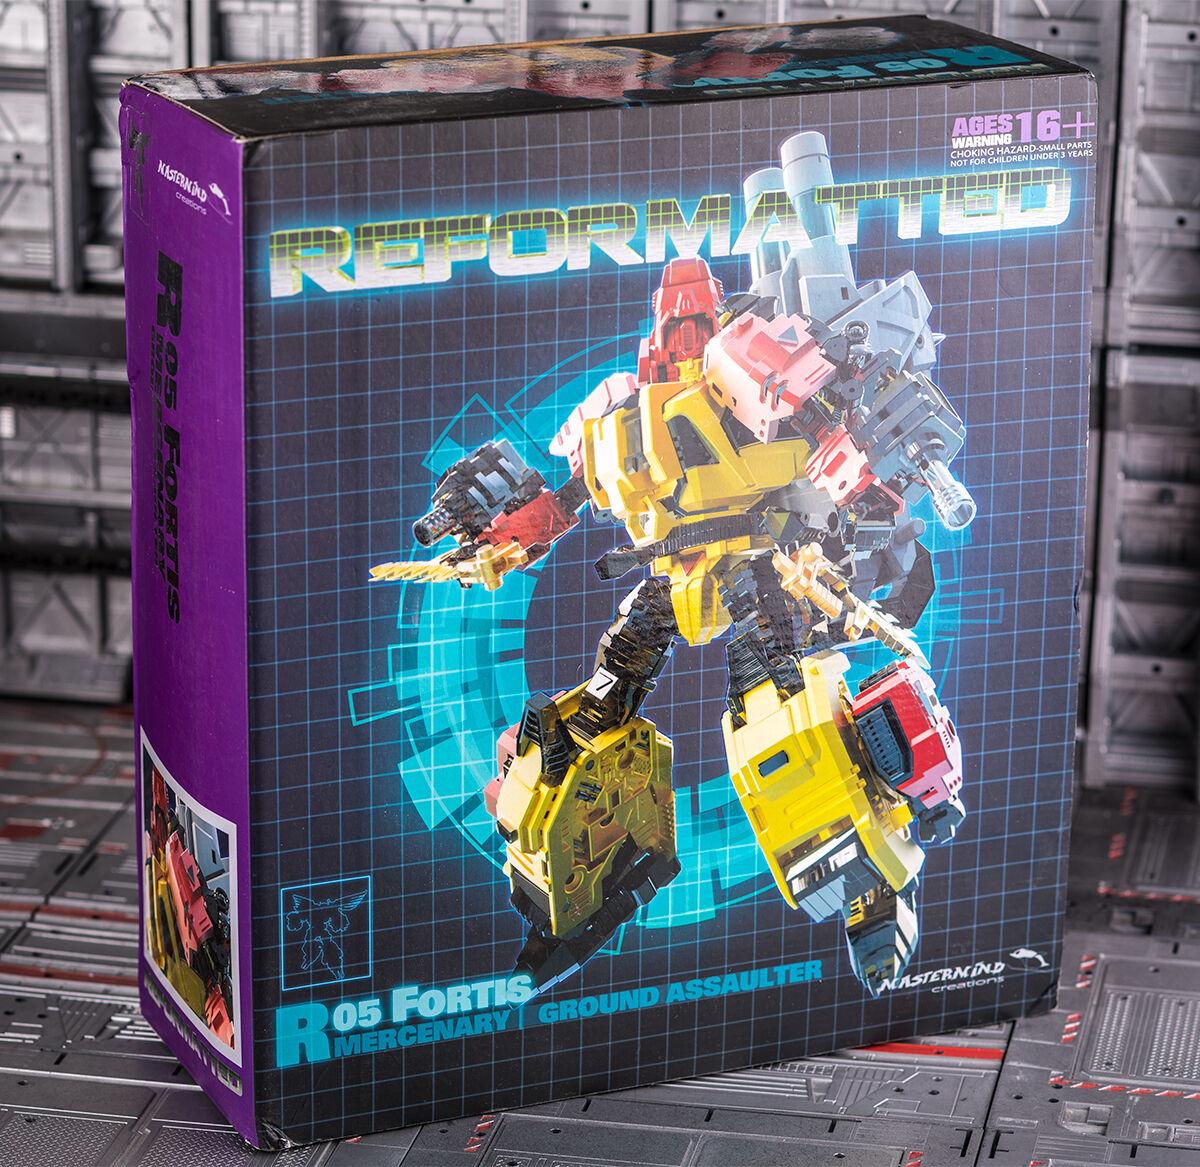 Transformers MMC R05 Fortis Mercenary Headstrong Predaking